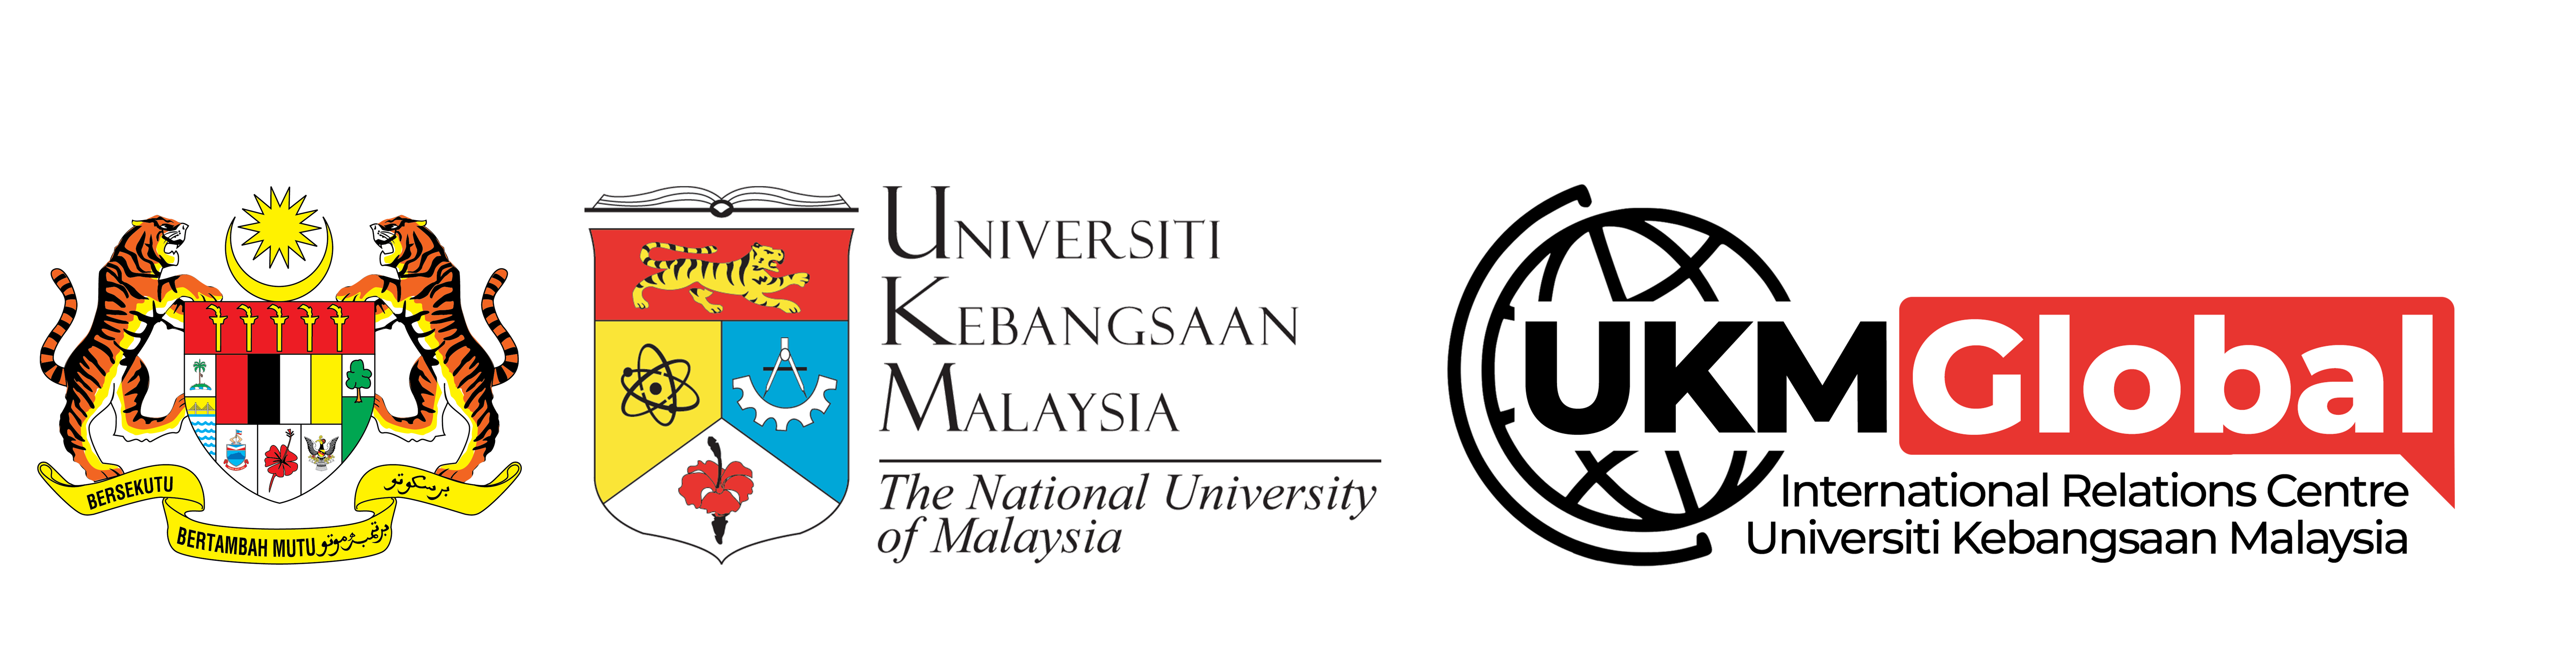 International Relations Centre (UKM Global)